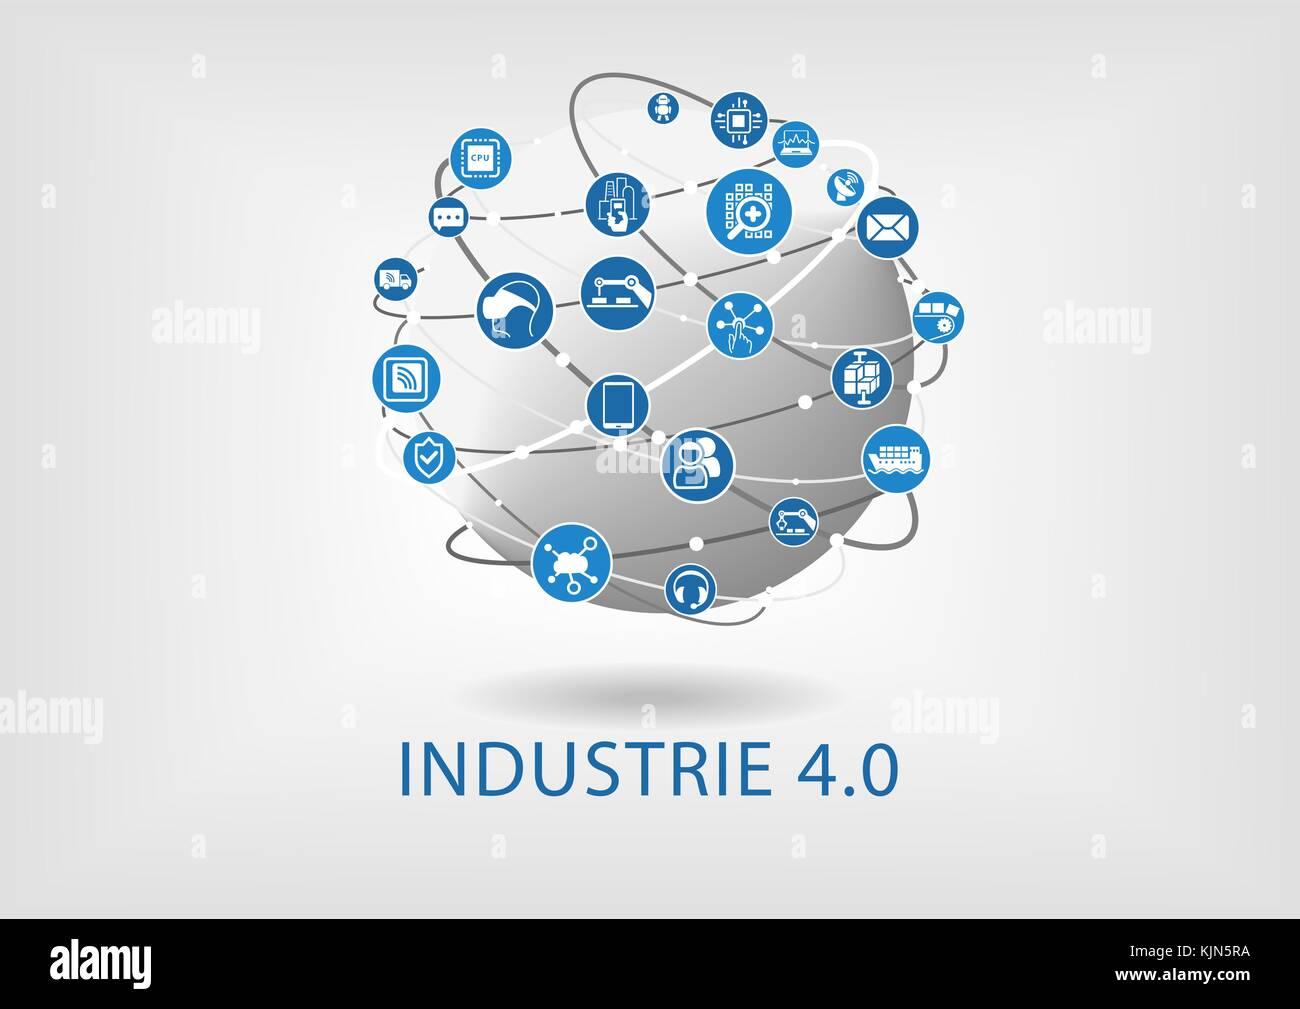 Industrie 4.0 Konzept als Vektor Illustration mit Erdball. - Stock Vector